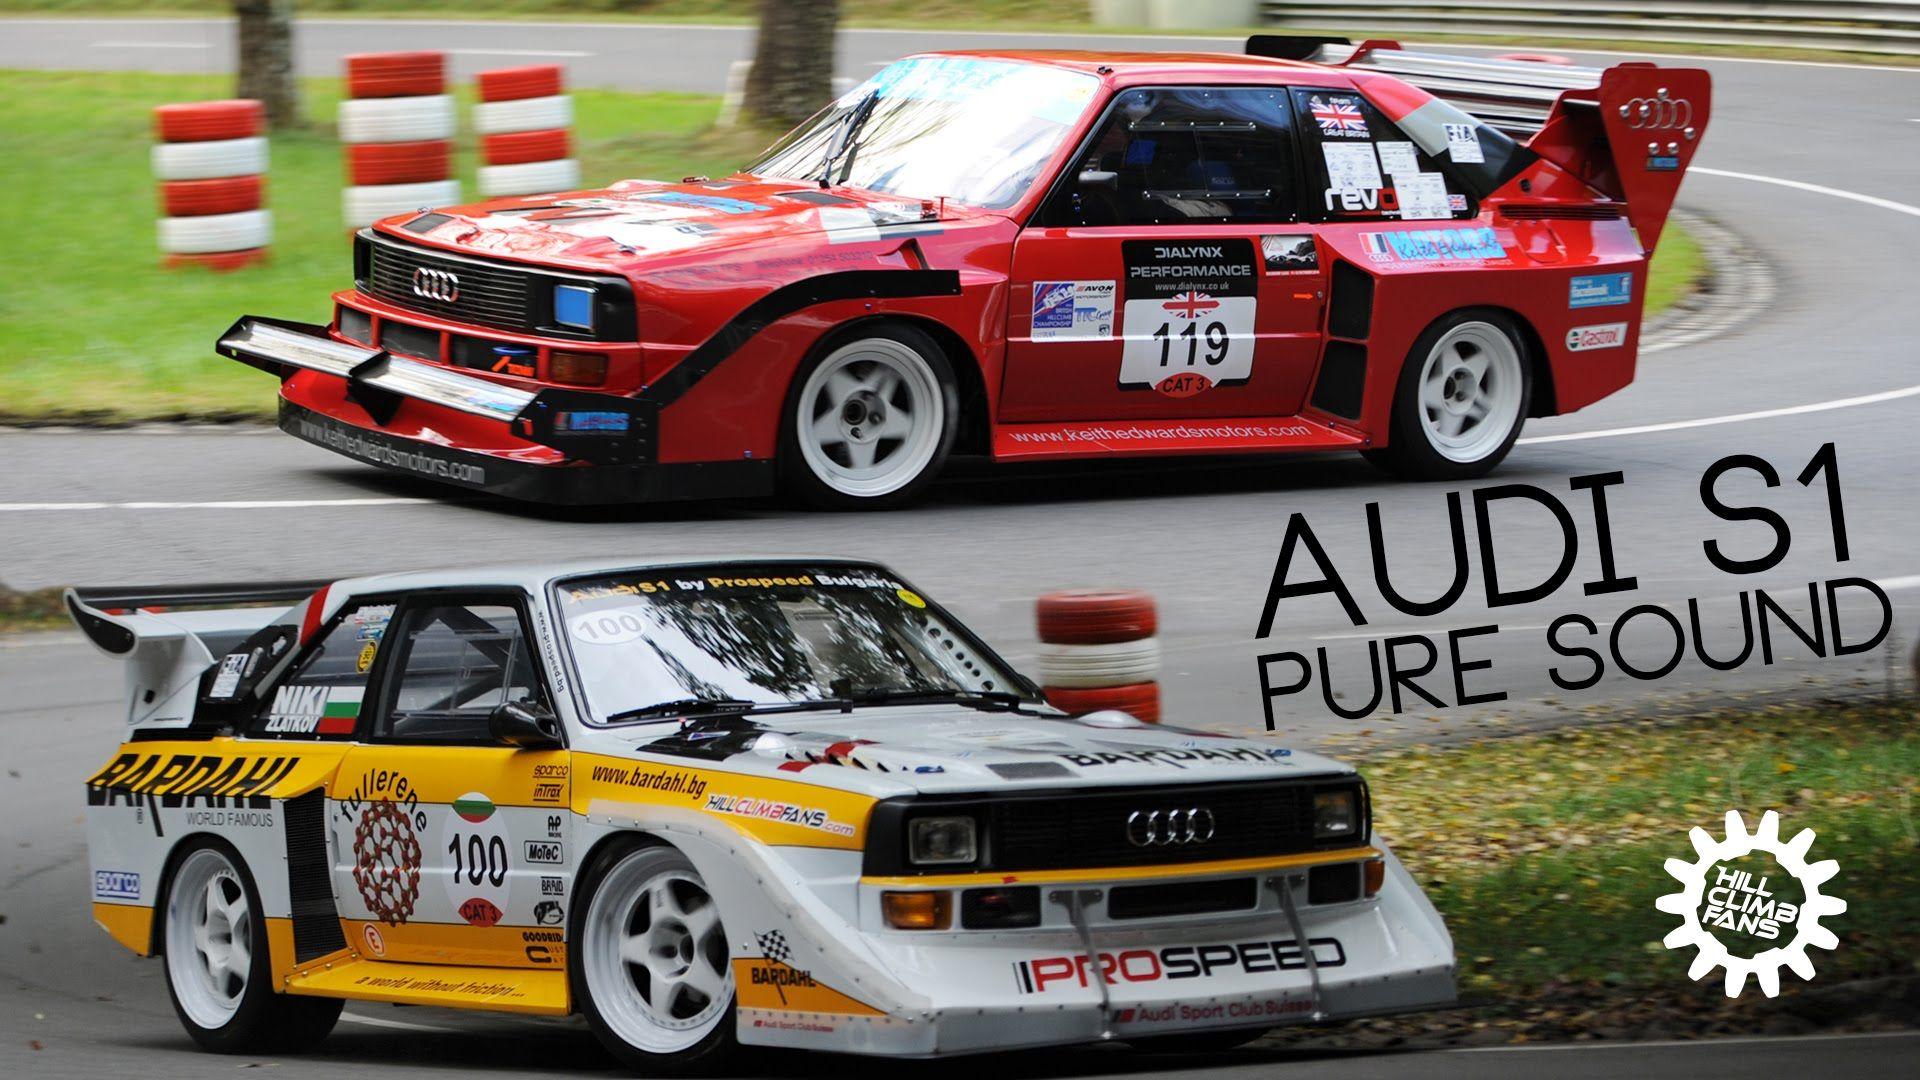 Audi S1 - Epic Sounds Battle 2014   Audi sport, Audi, Audi ...